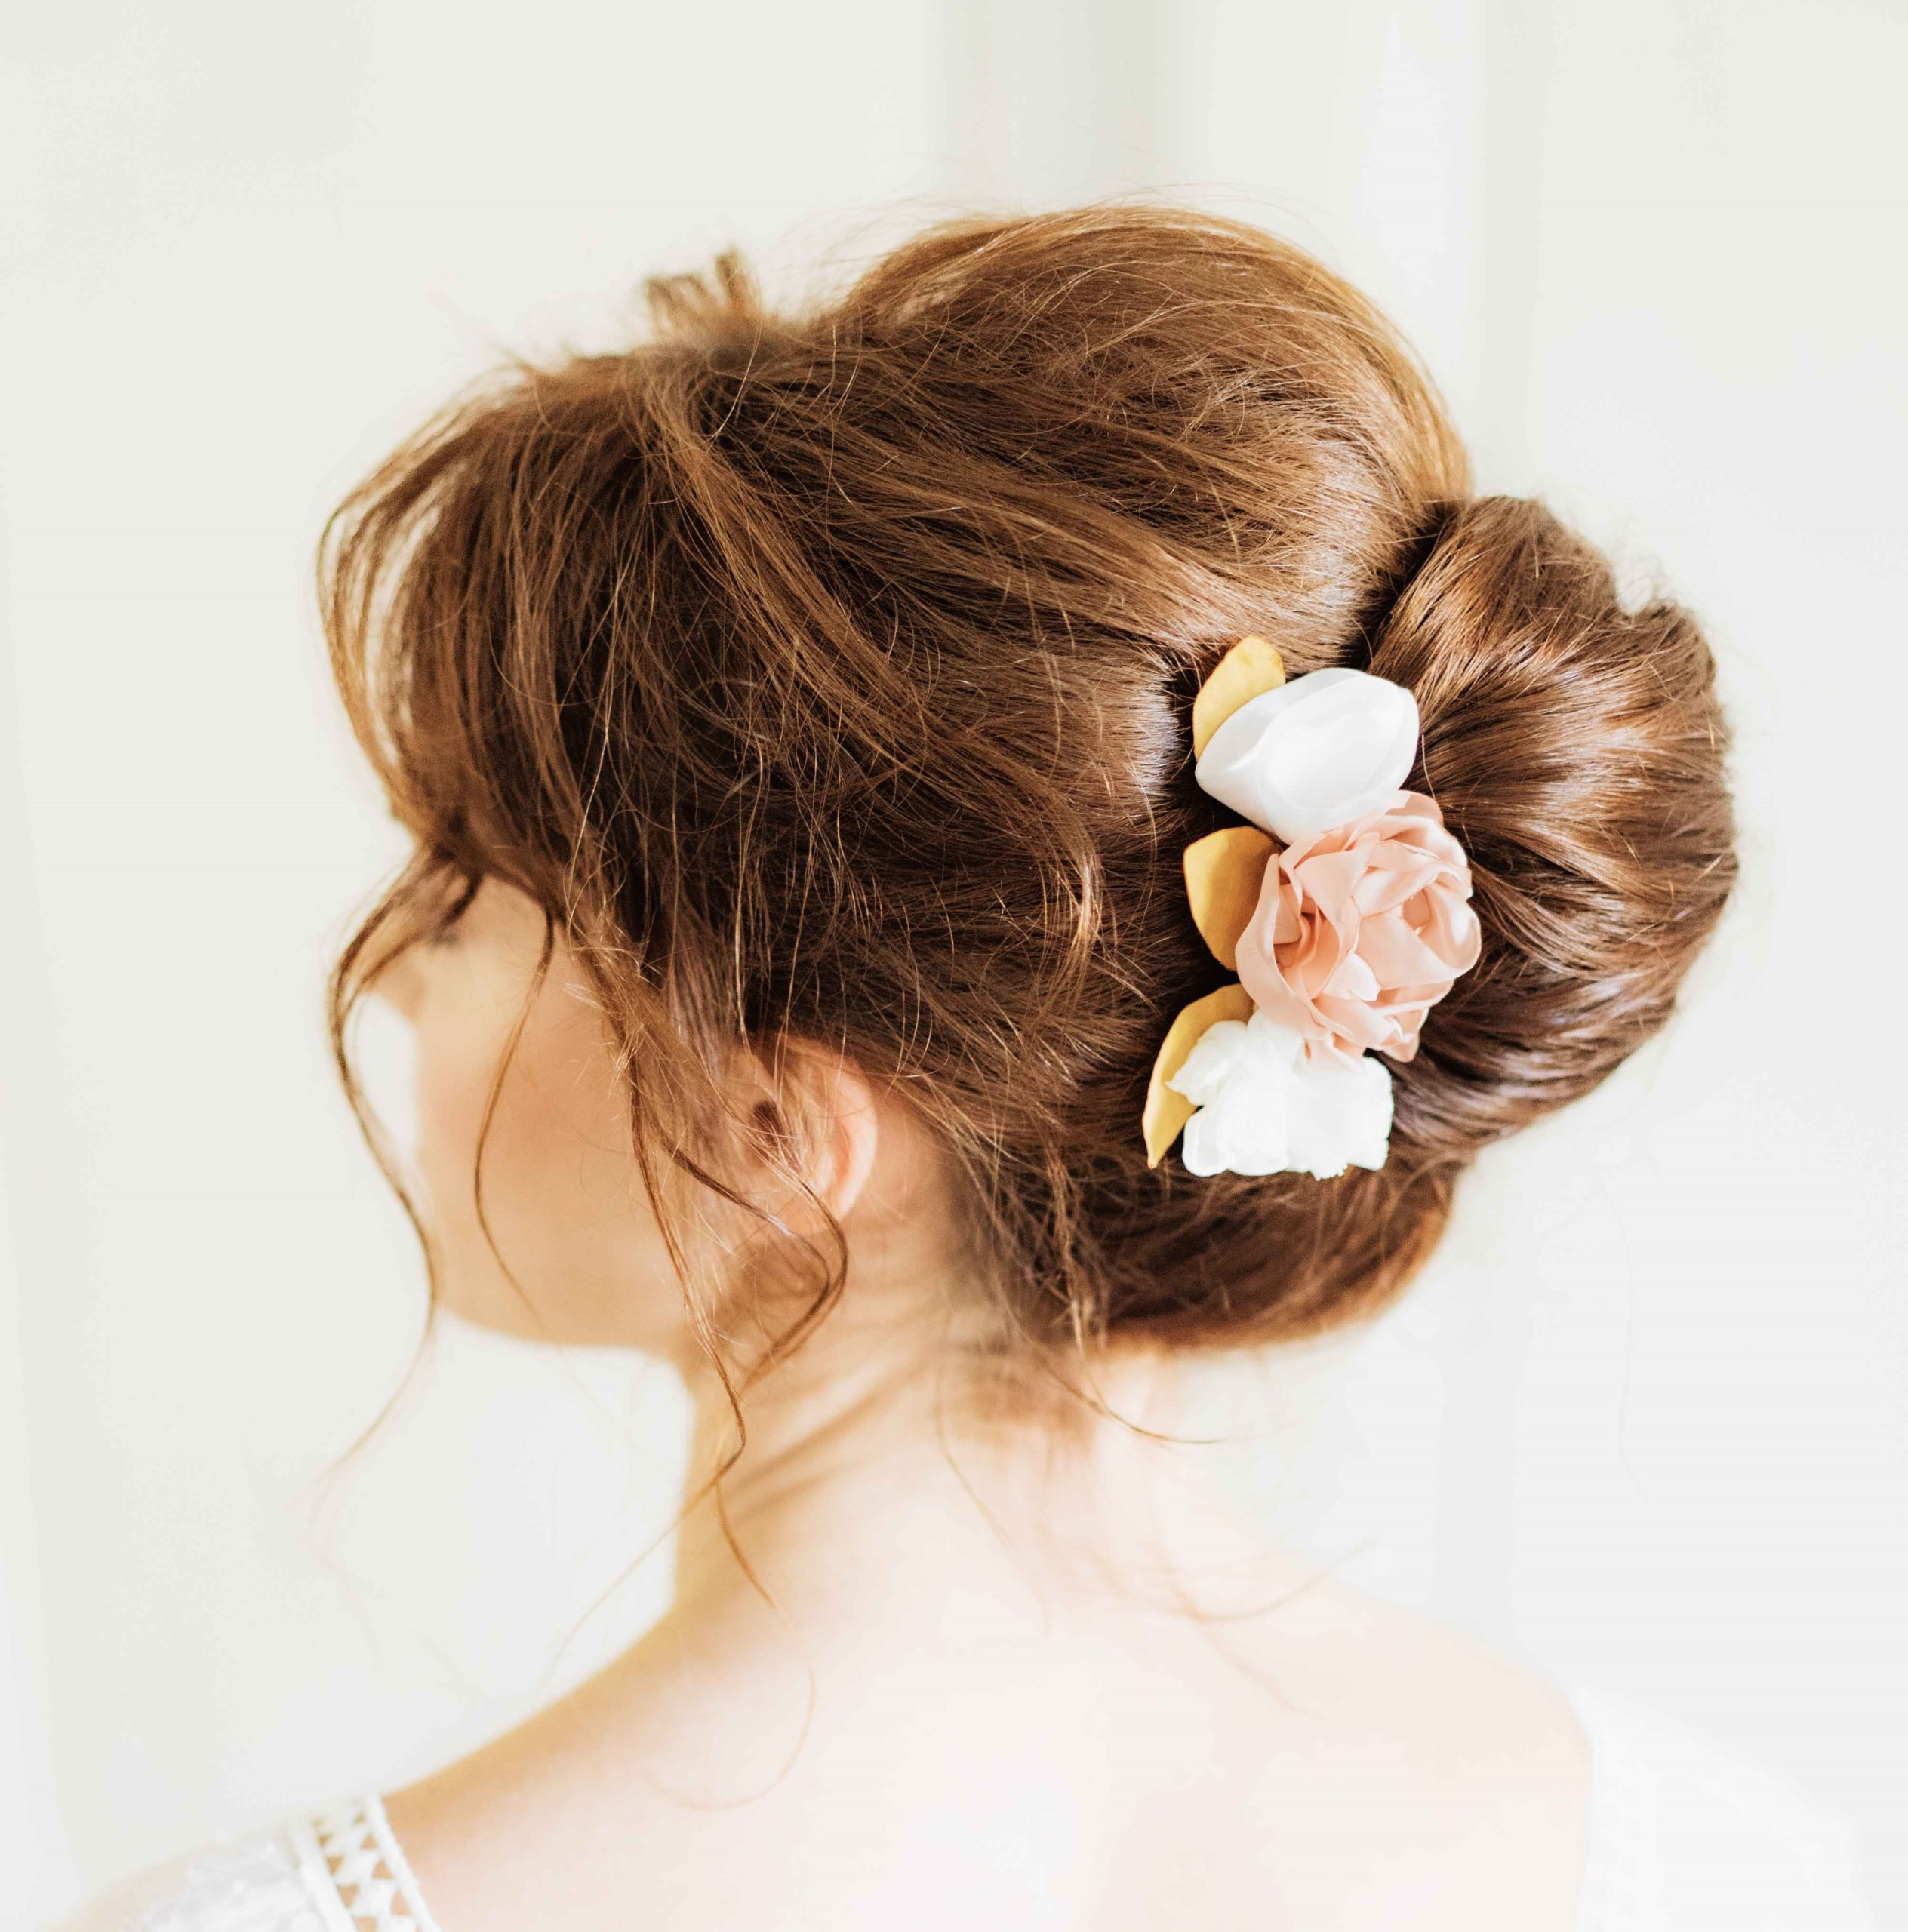 Peigne Apolline 2 Alice Marty - Couture florale Accessoires Mariage